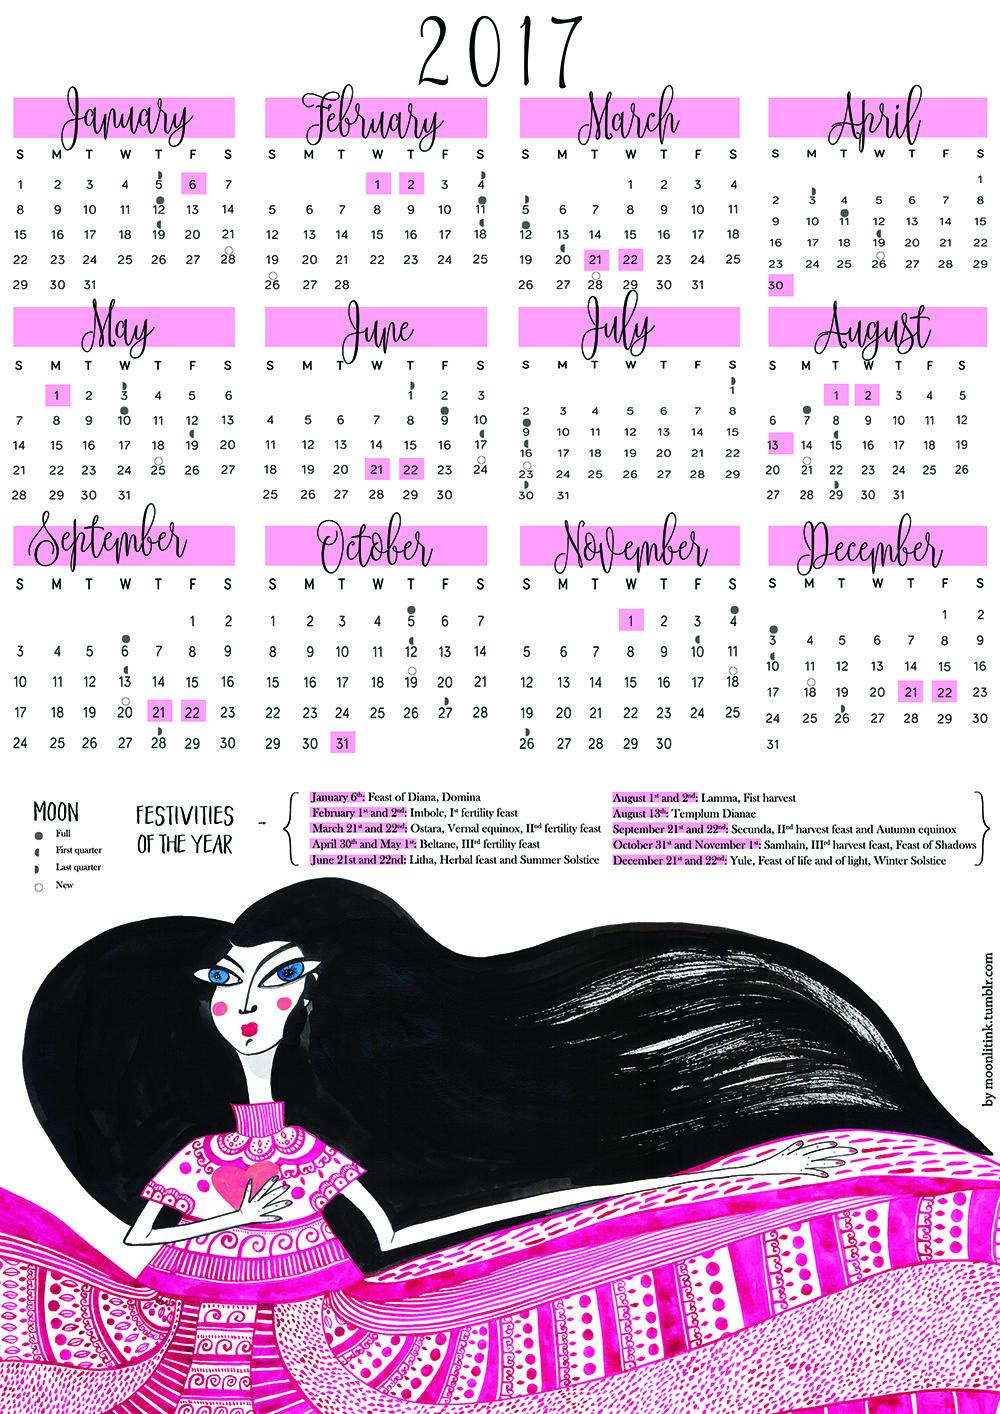 2017 Calendar by Virginia Elena Patrone